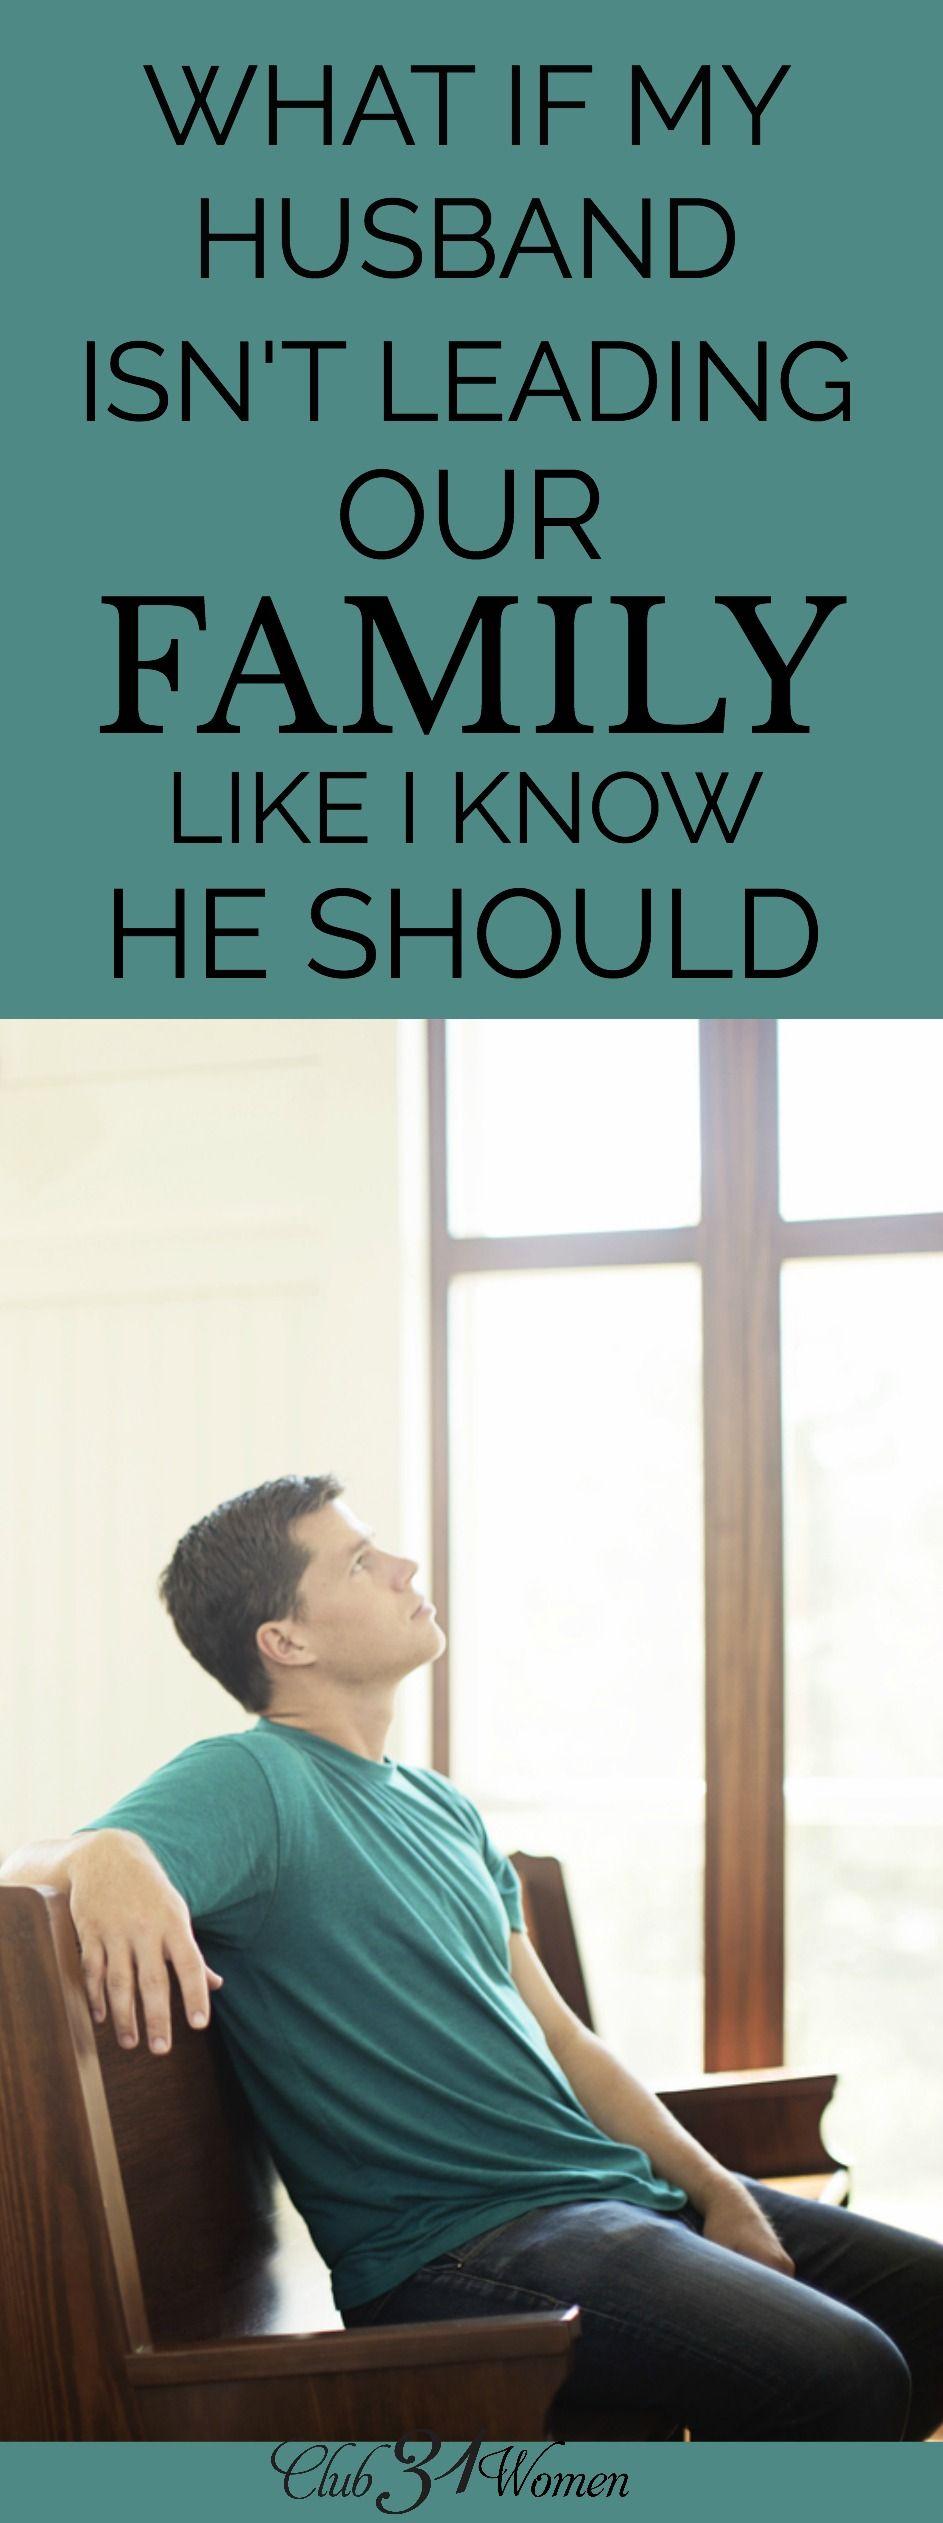 What should I do if my husband leaves